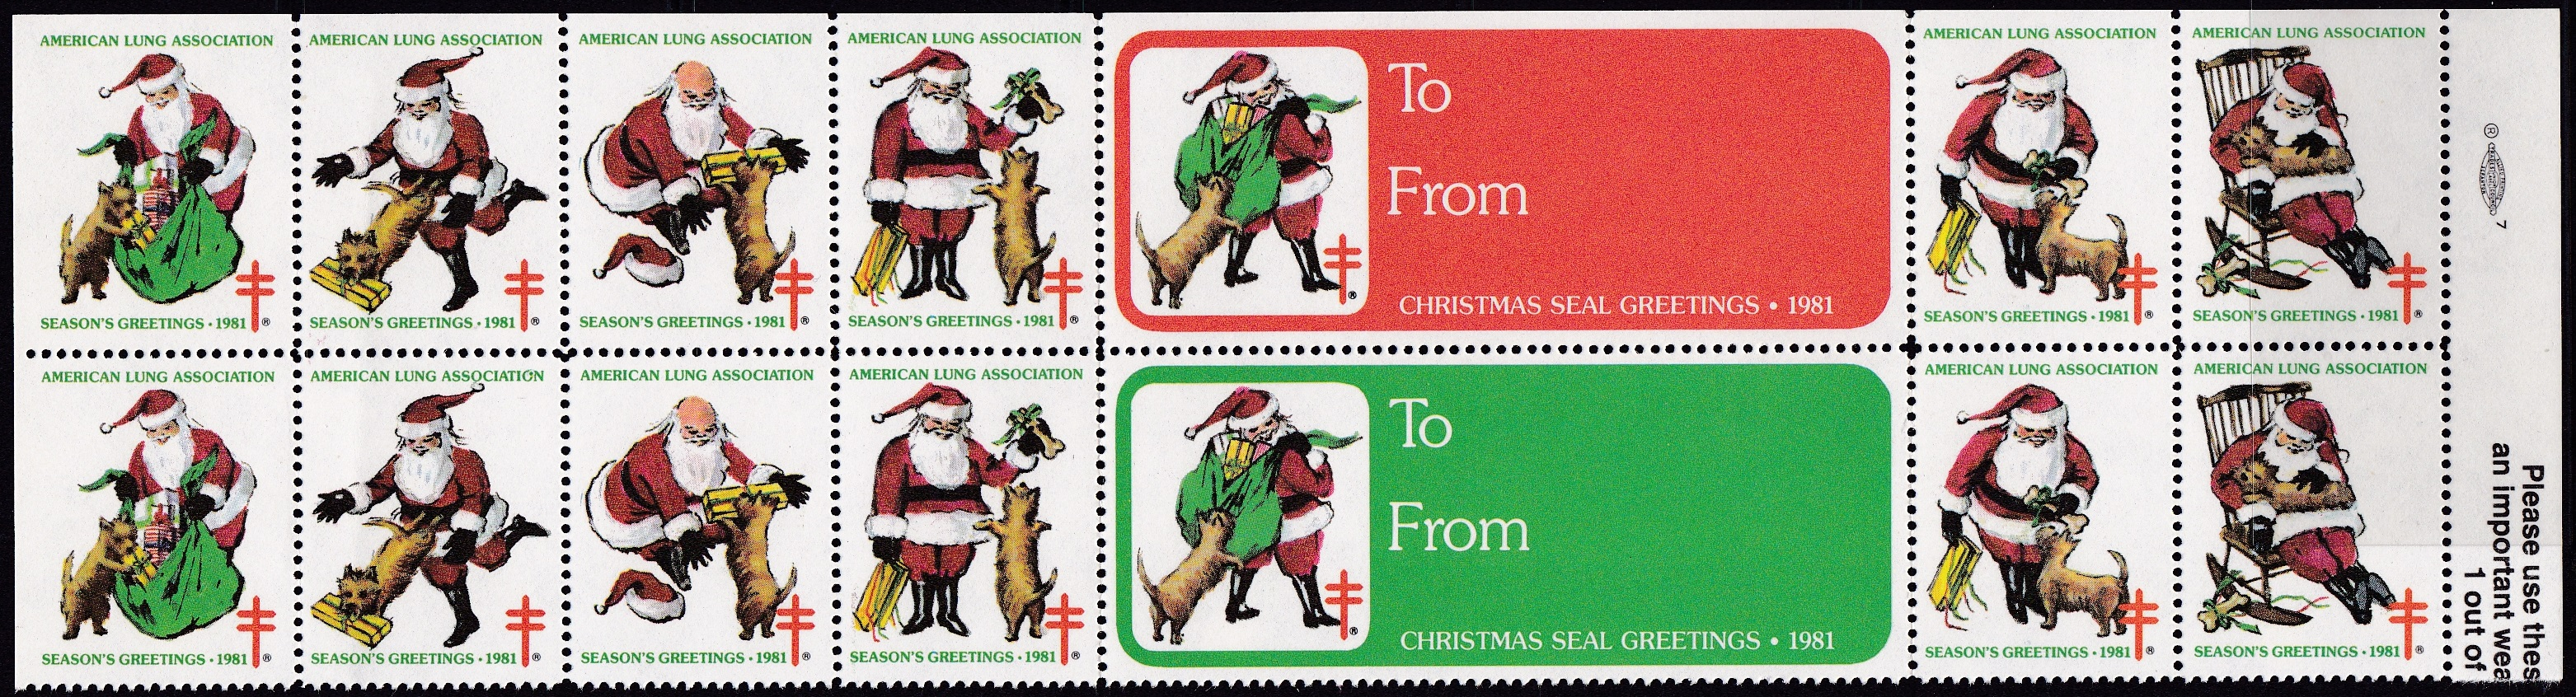 1981 Santa & Dog Christmas Seal Design Experiment